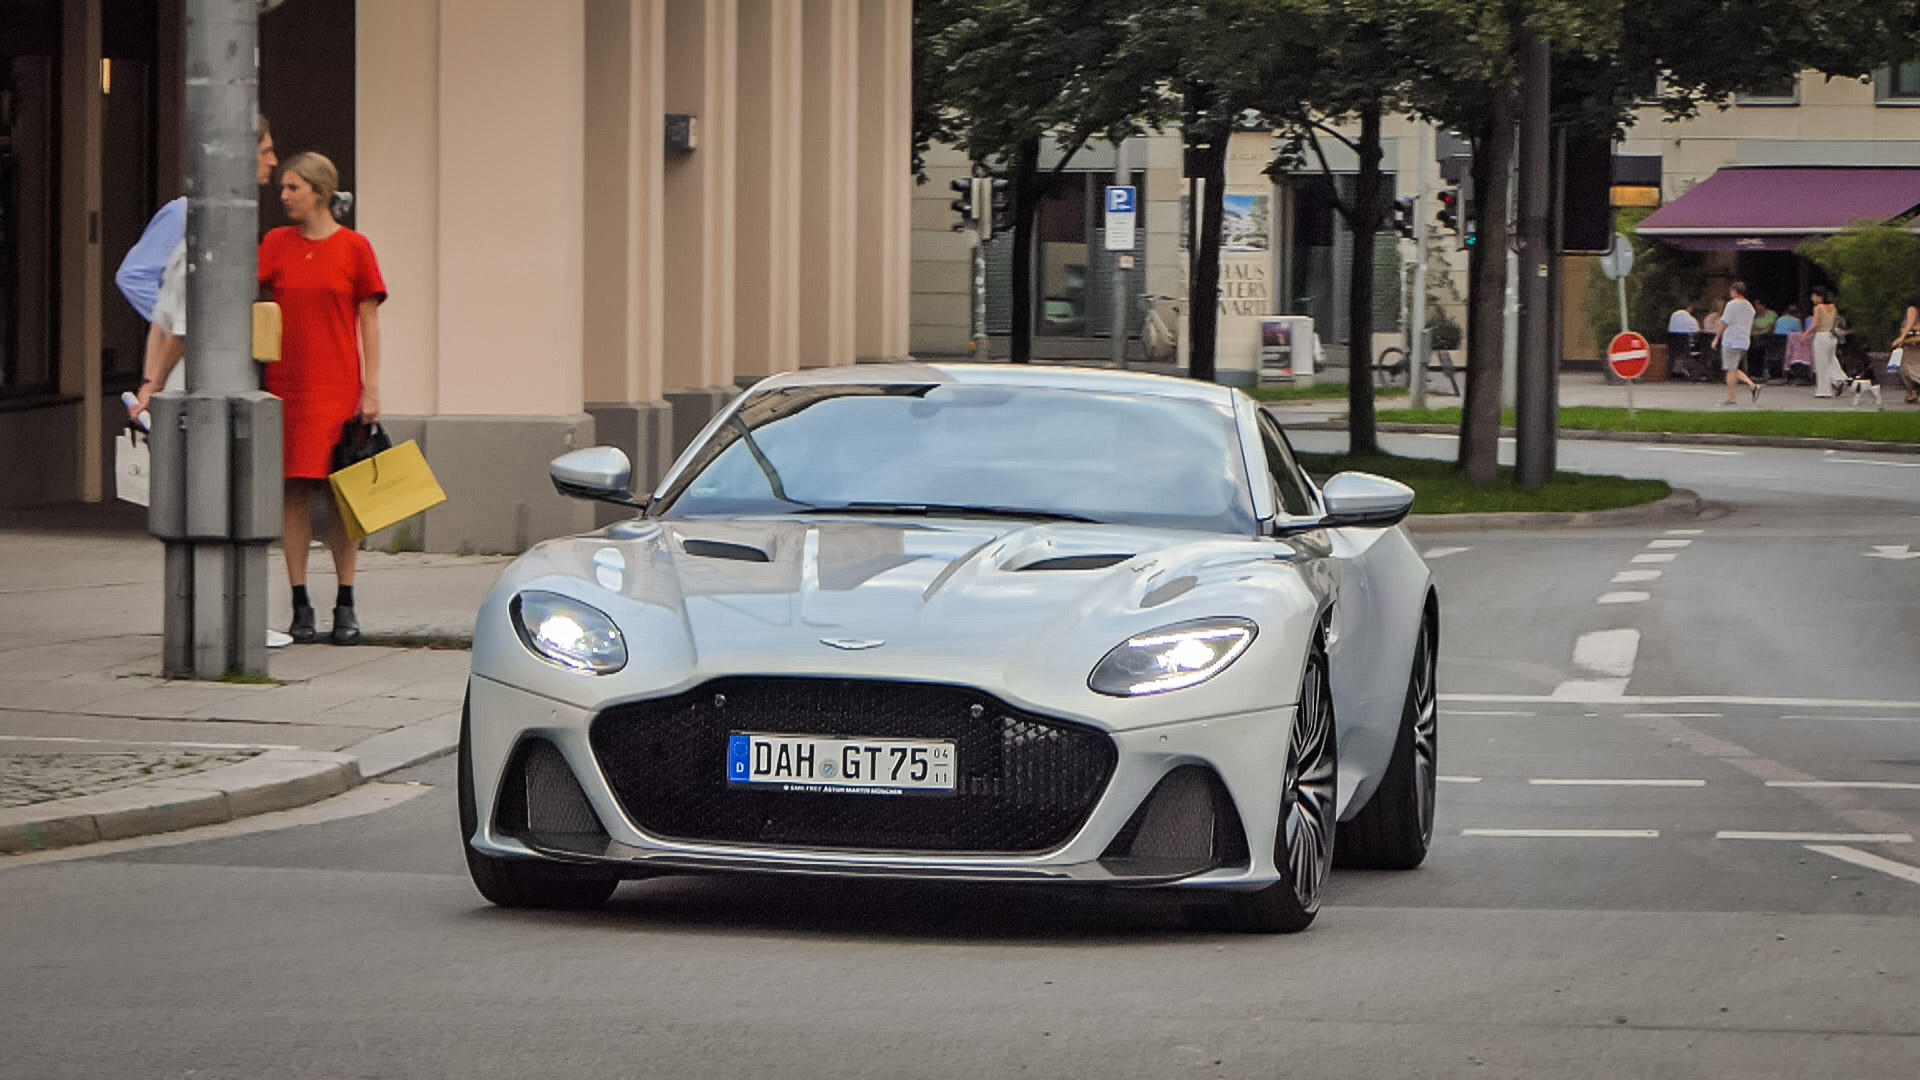 Aston Martin DBS Superleggera - DAH-GT-75